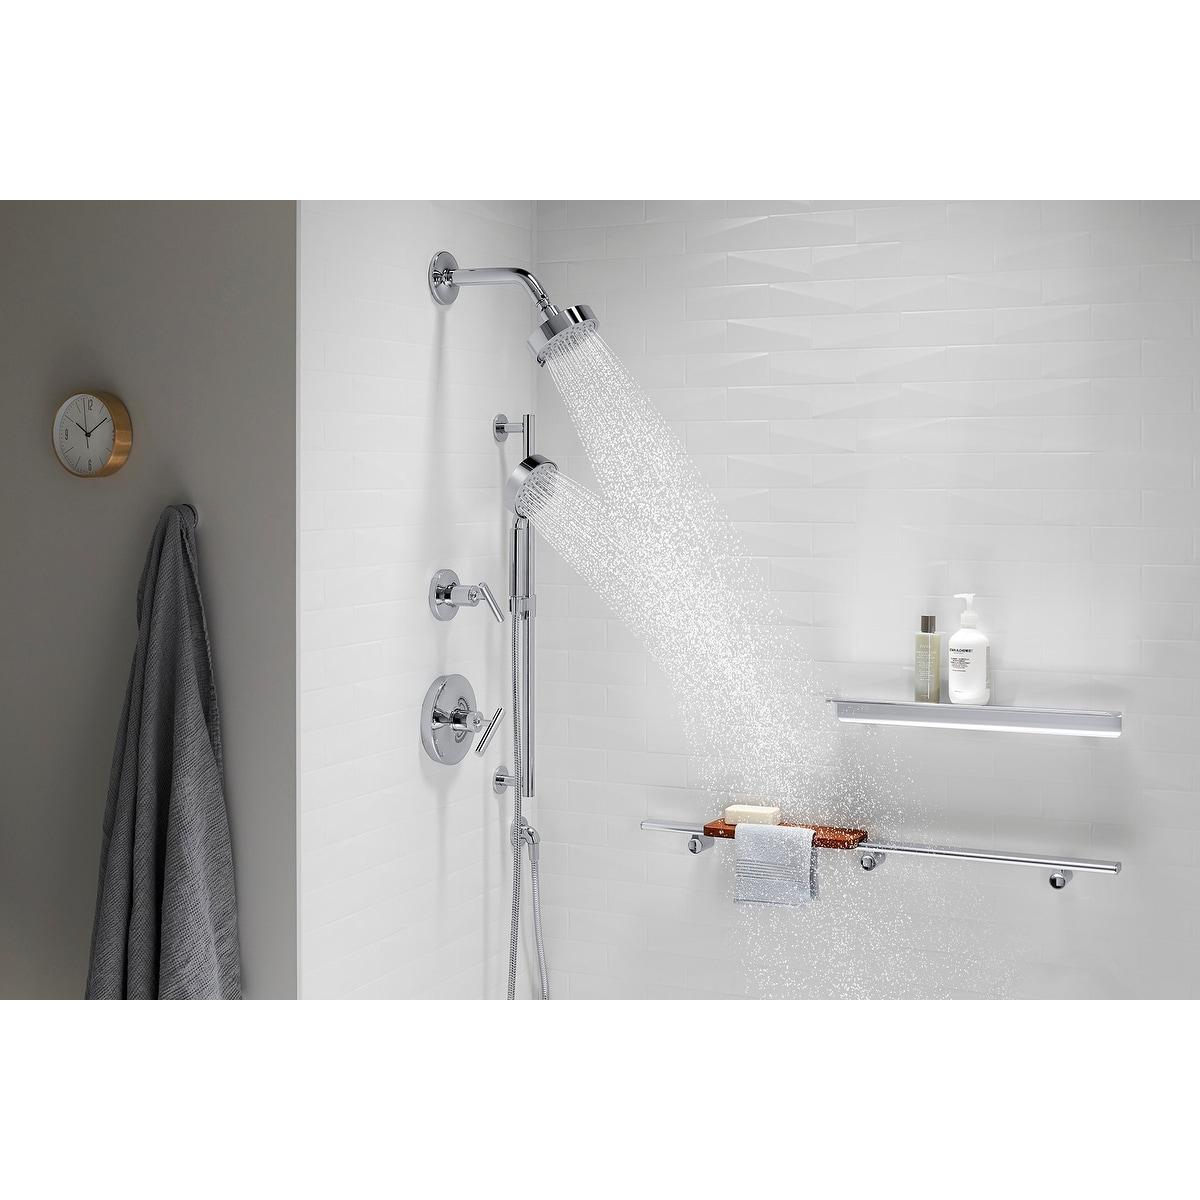 Kohler K 22170 G Purist 1 75 Gpm Multi Function Shower Head